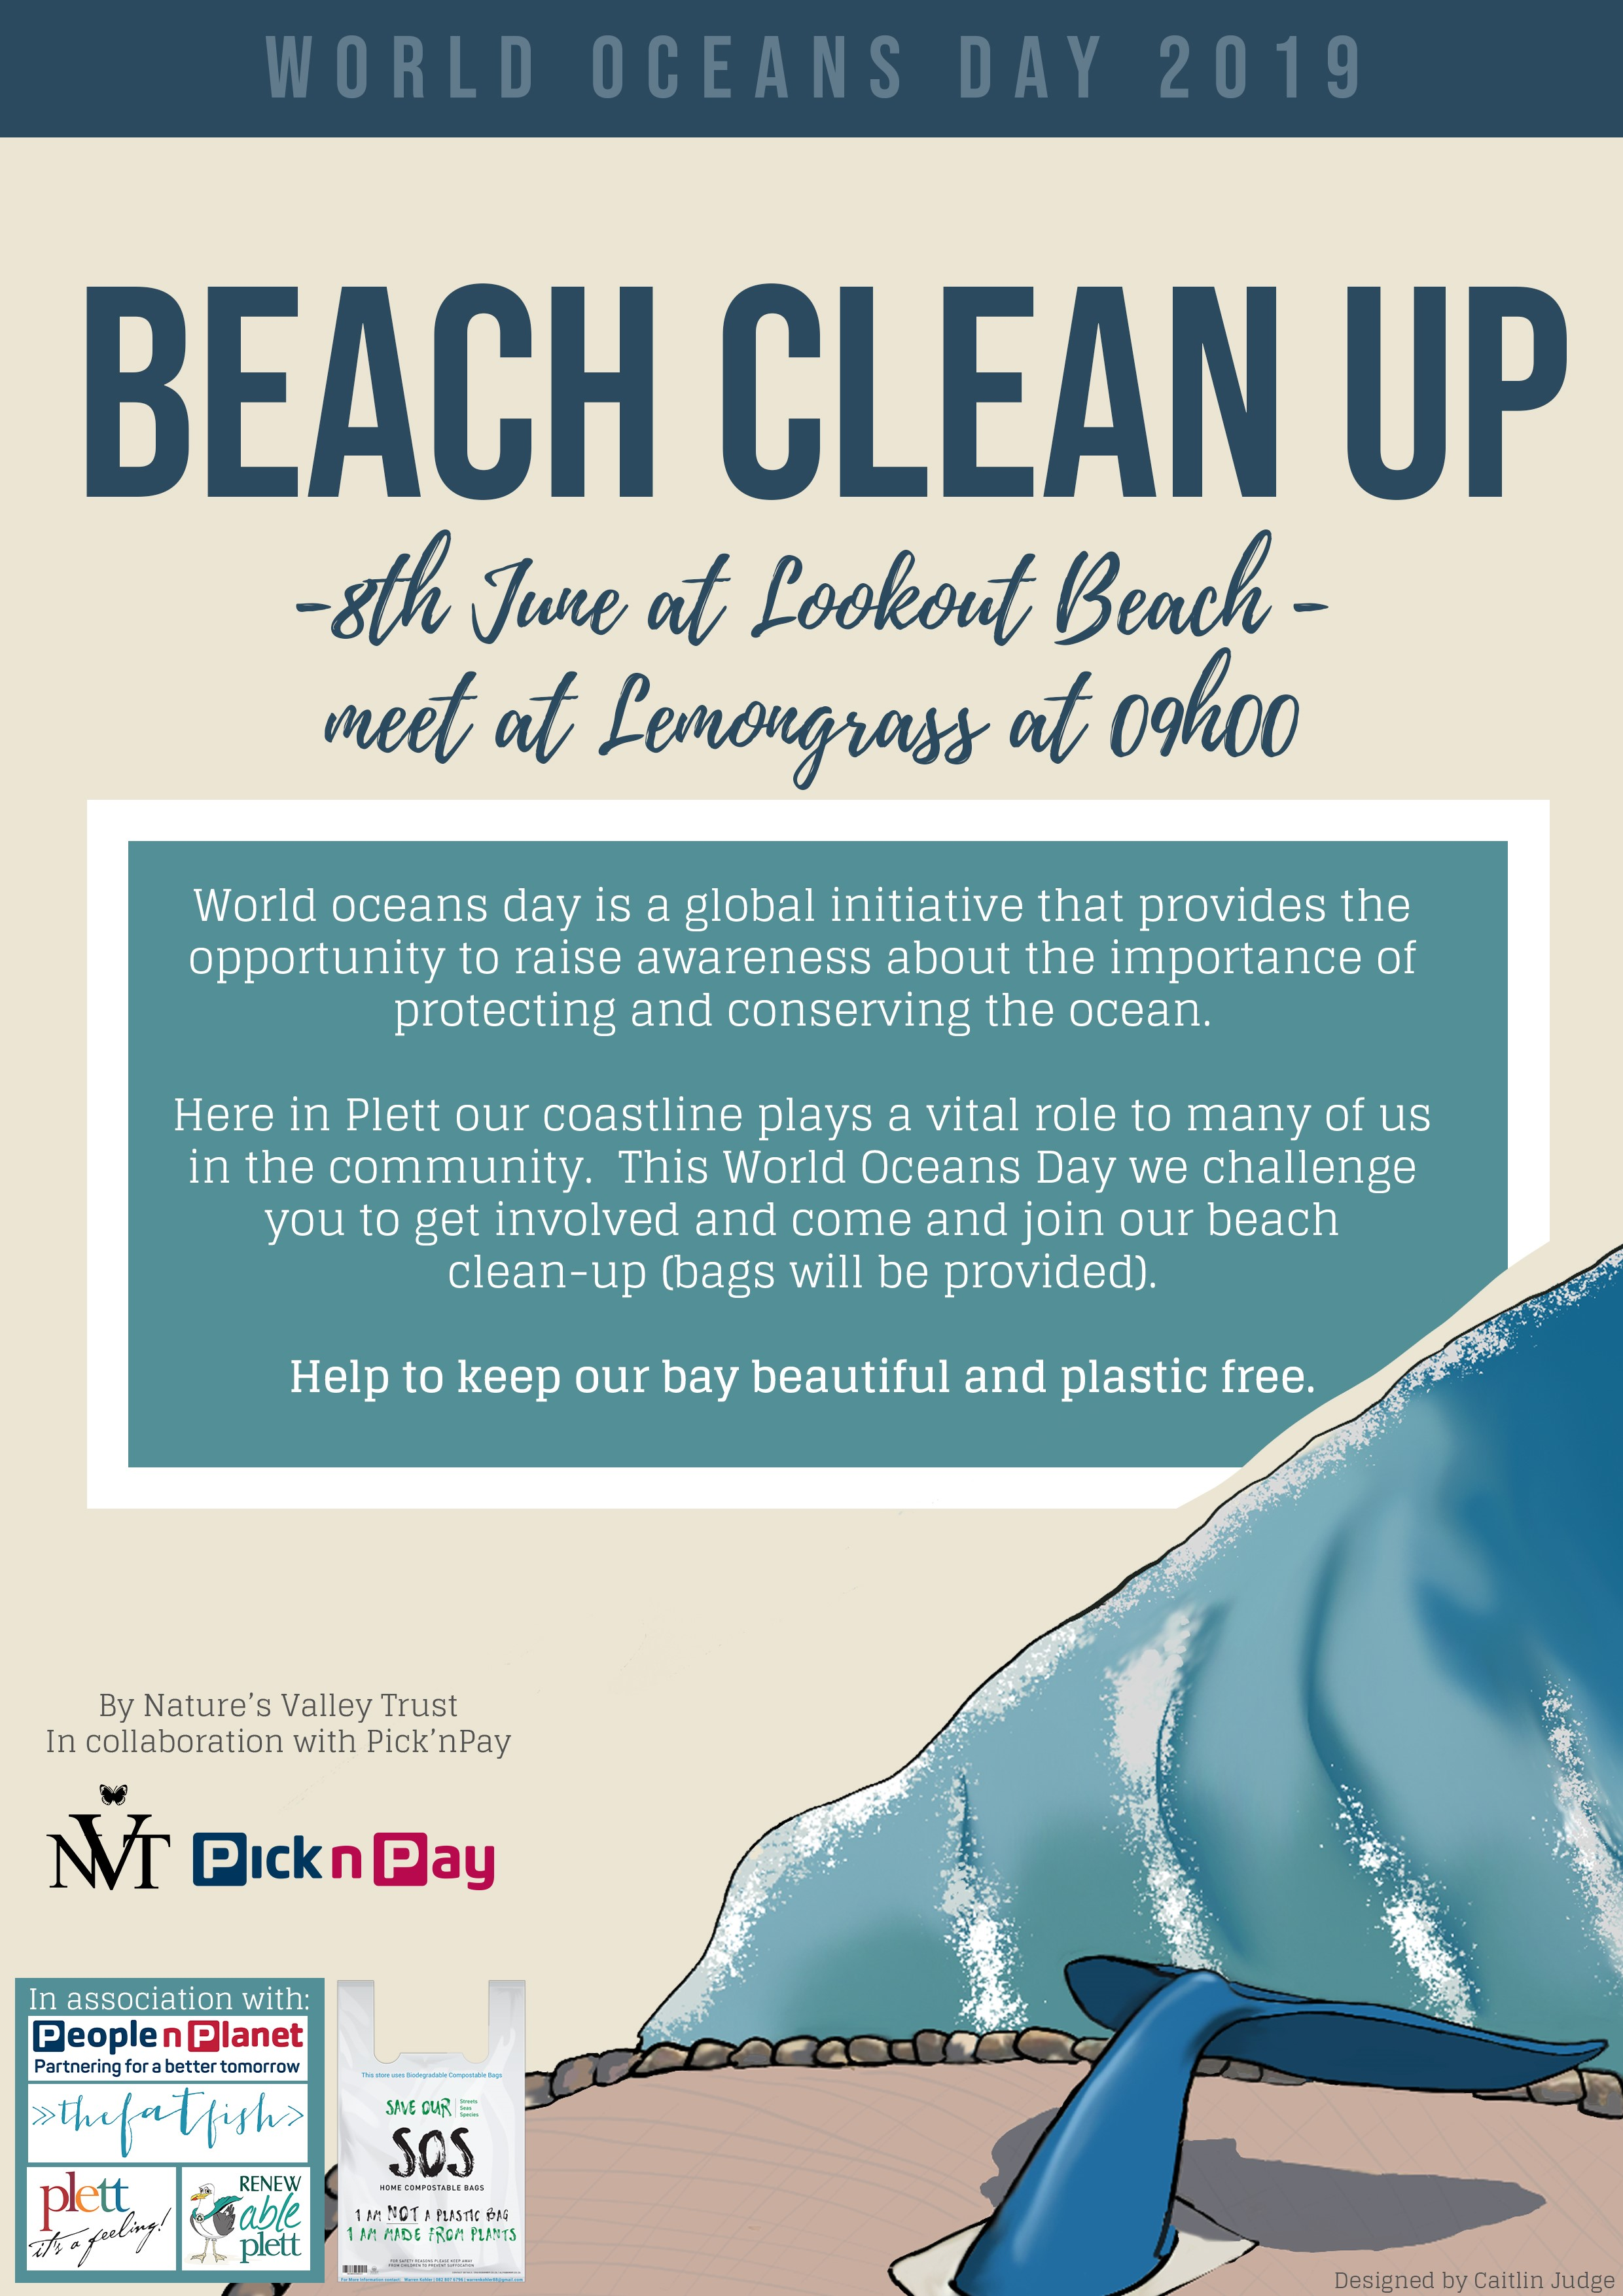 Beach clean up with NVT Plett Oceans Day